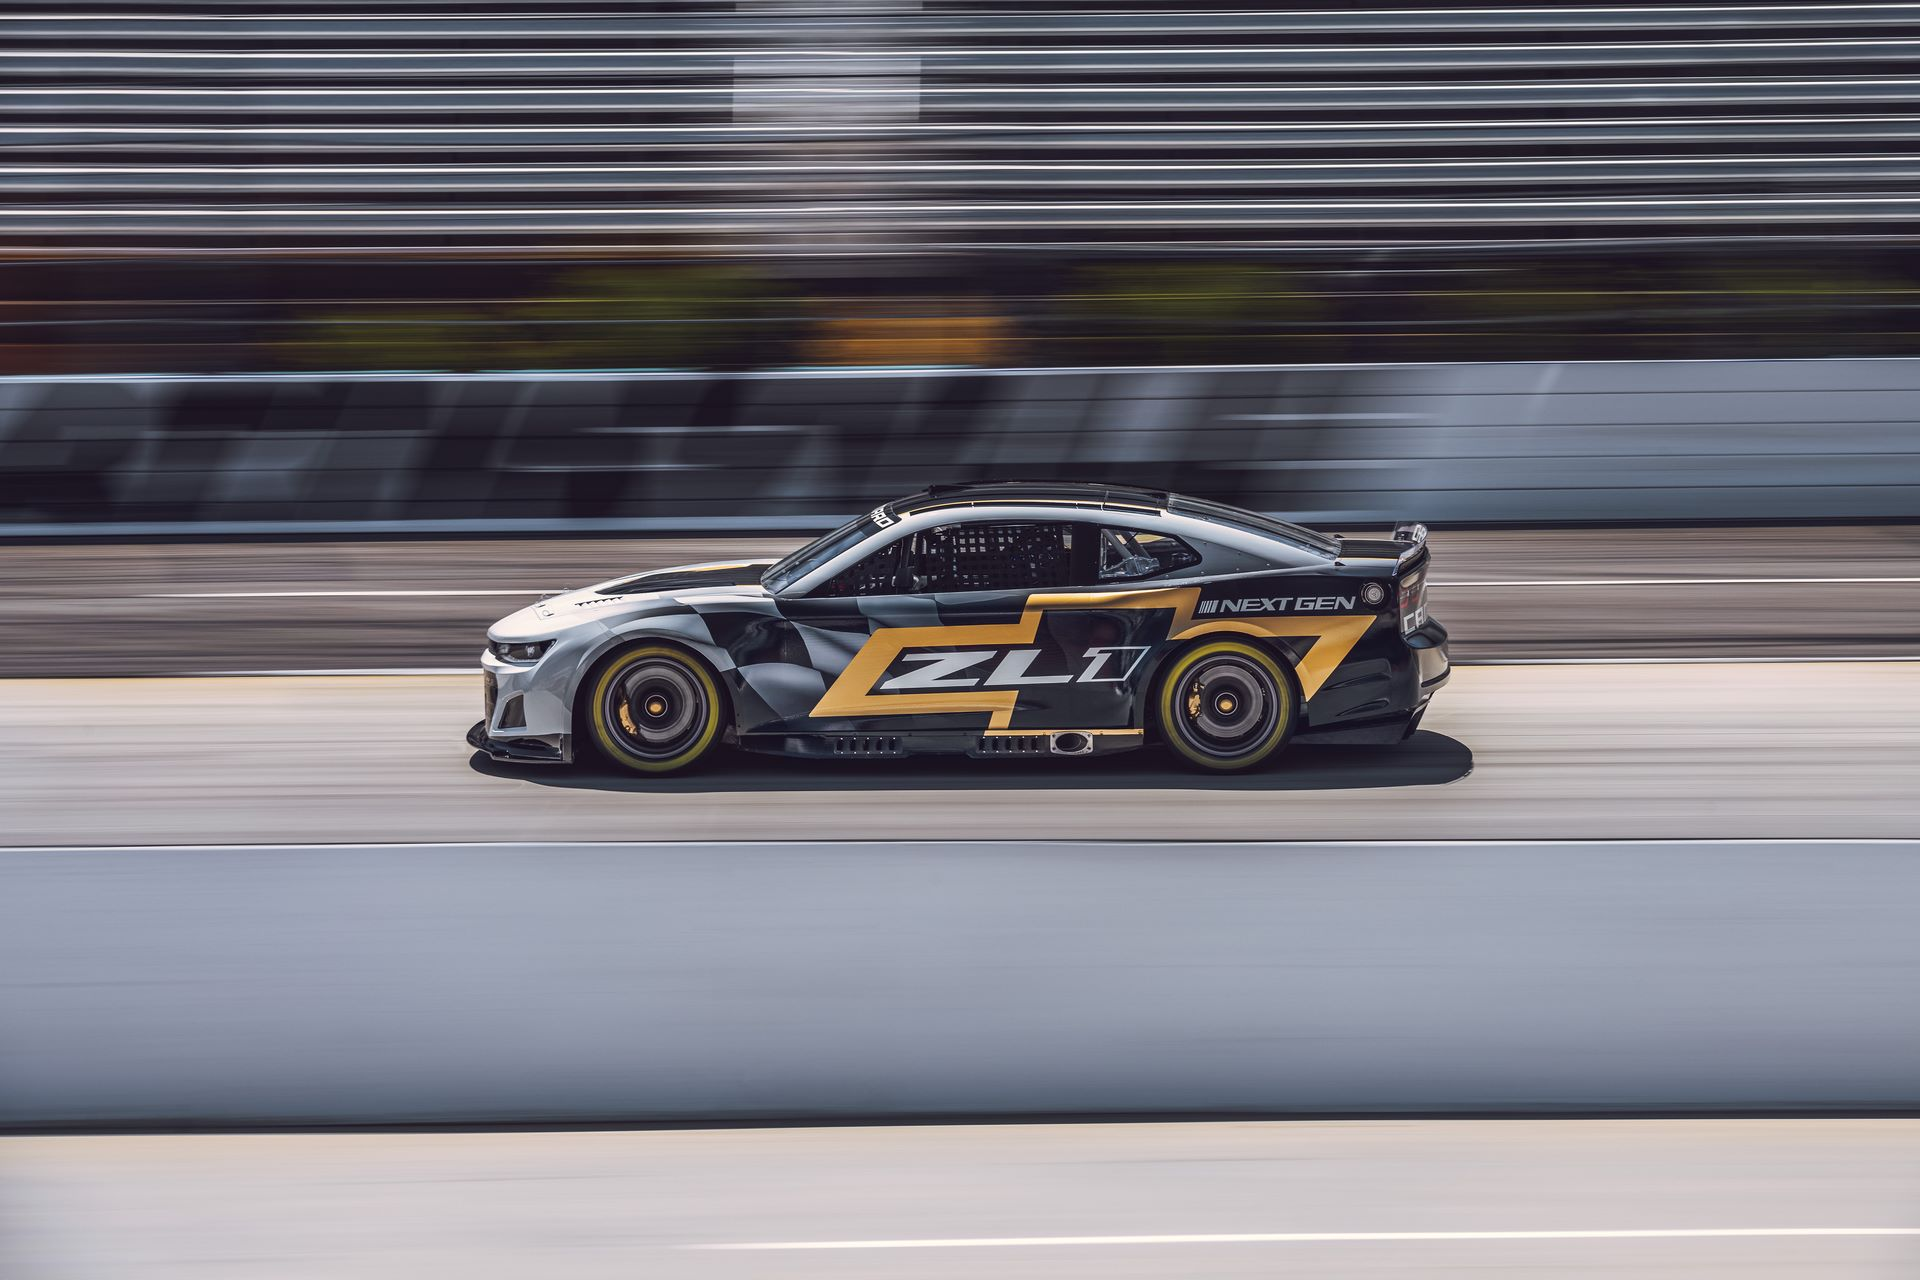 Chevrolet-Camaro-ZL1-RaceCarr-Next-Gen-Nascar-5